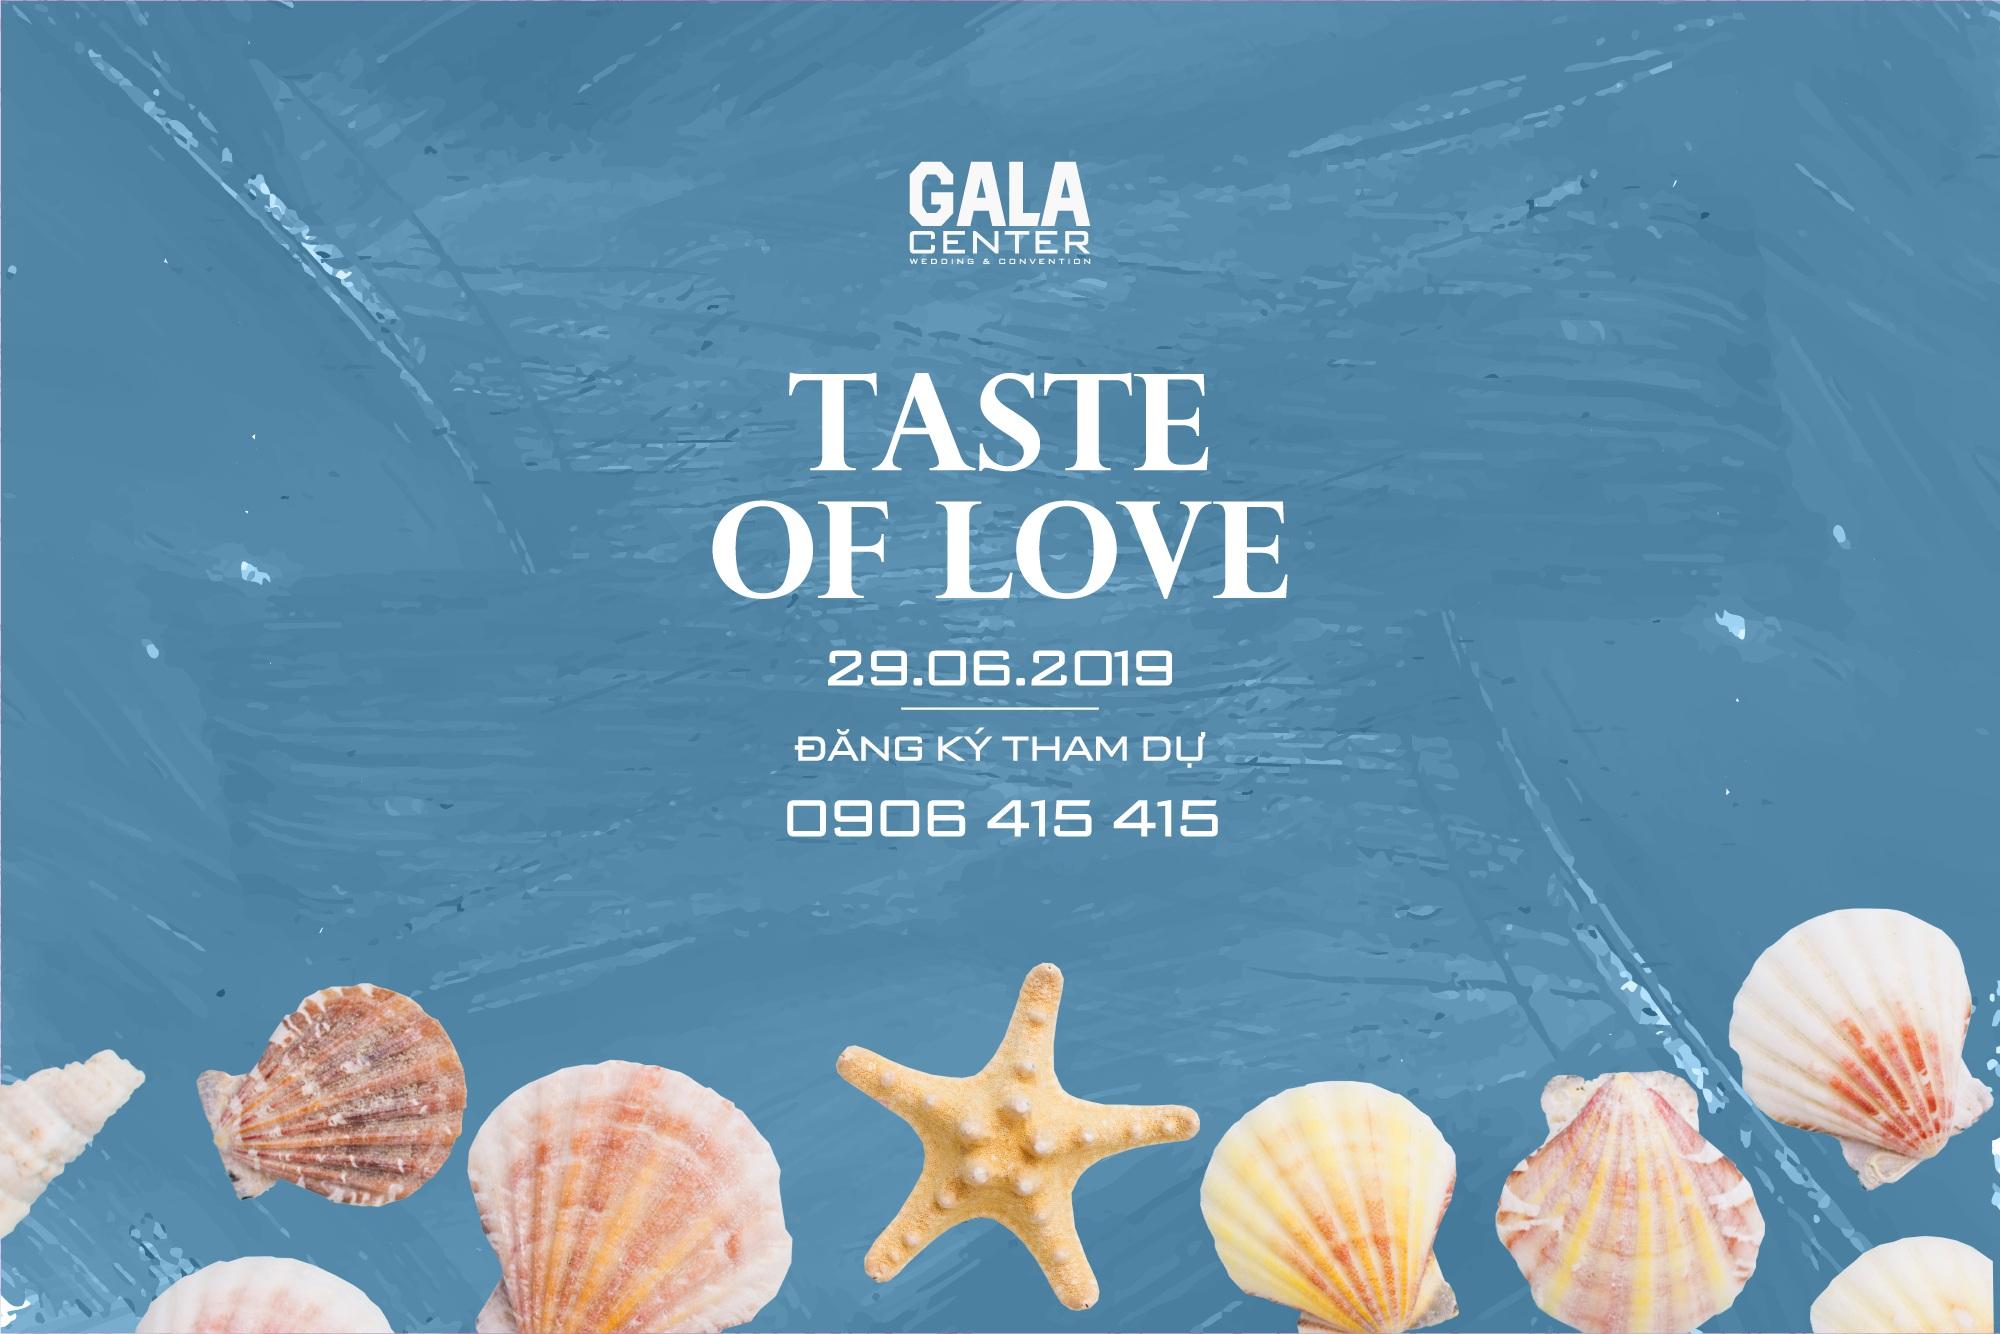 tiệc thử món Gala Center